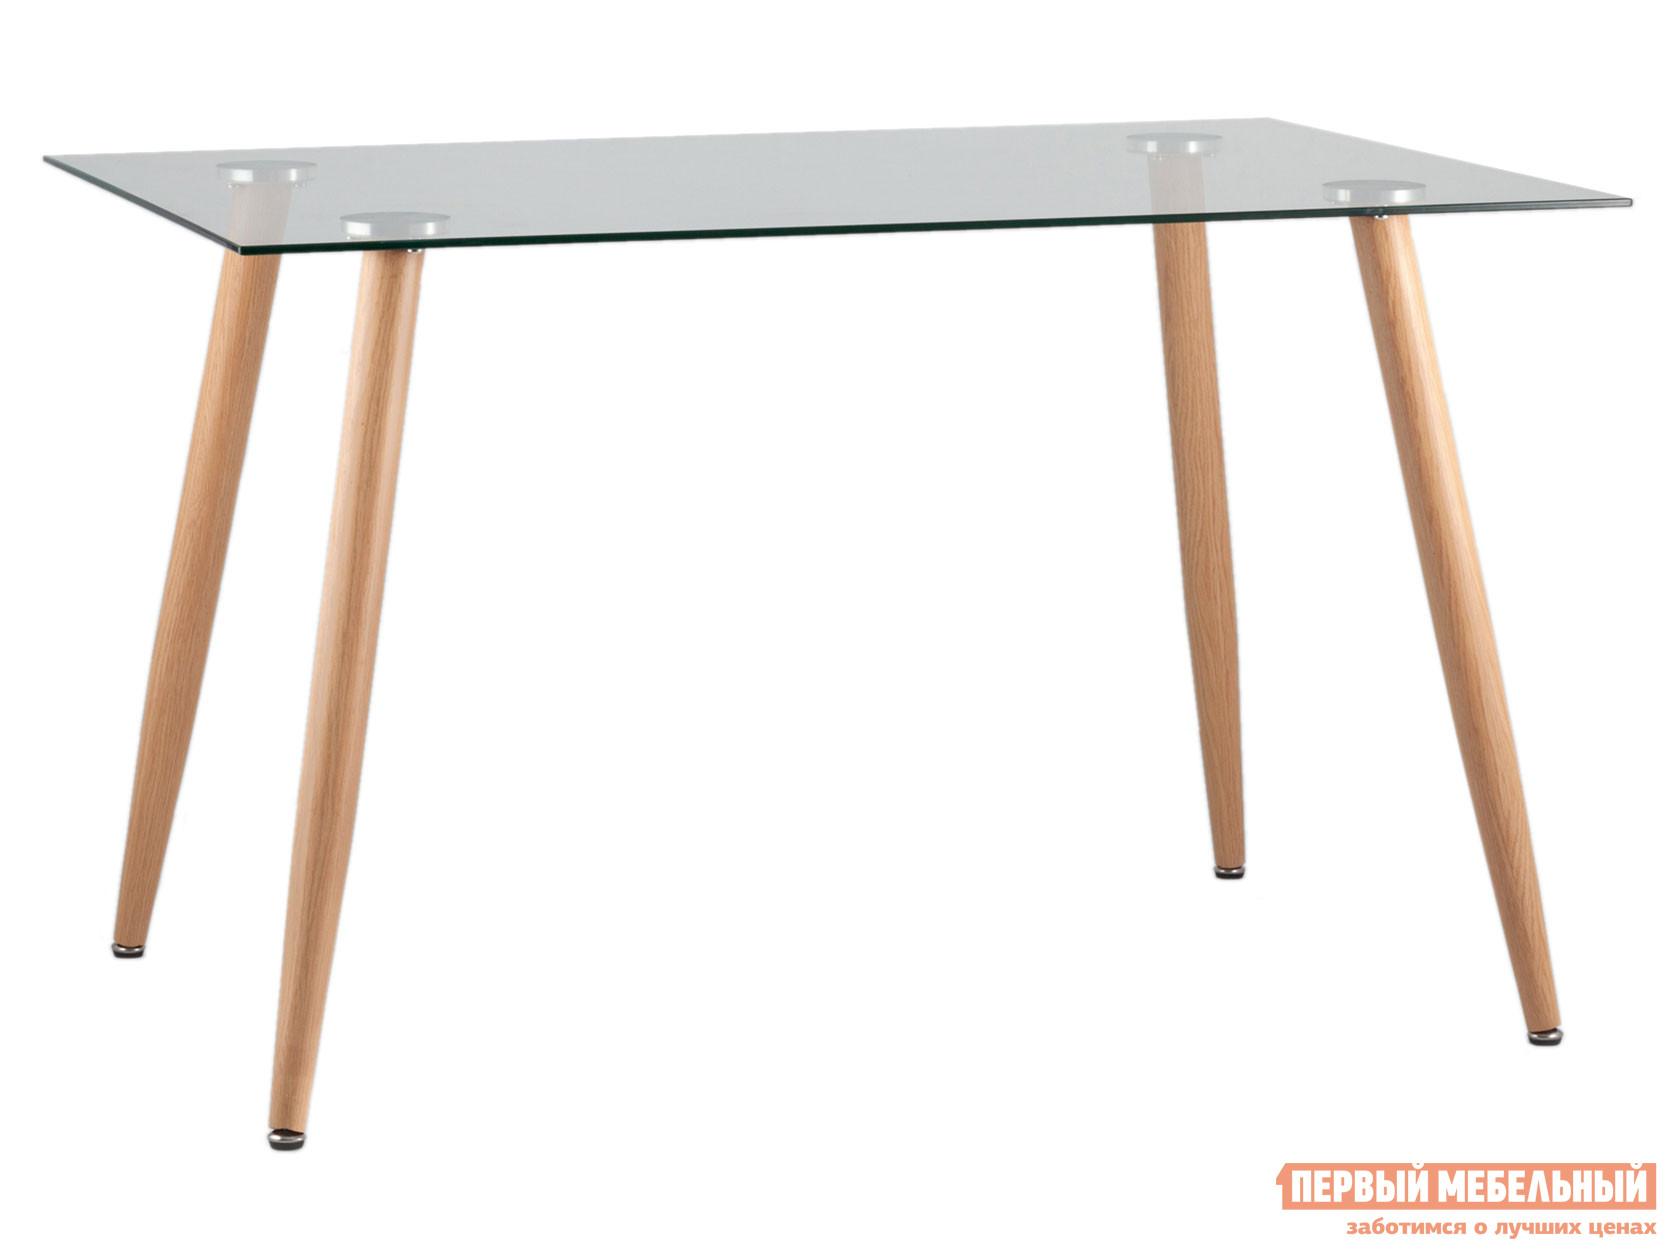 Кухонный стол  Освальд T022 + legs Прозрачное стекло / Металл Stool Group 102794